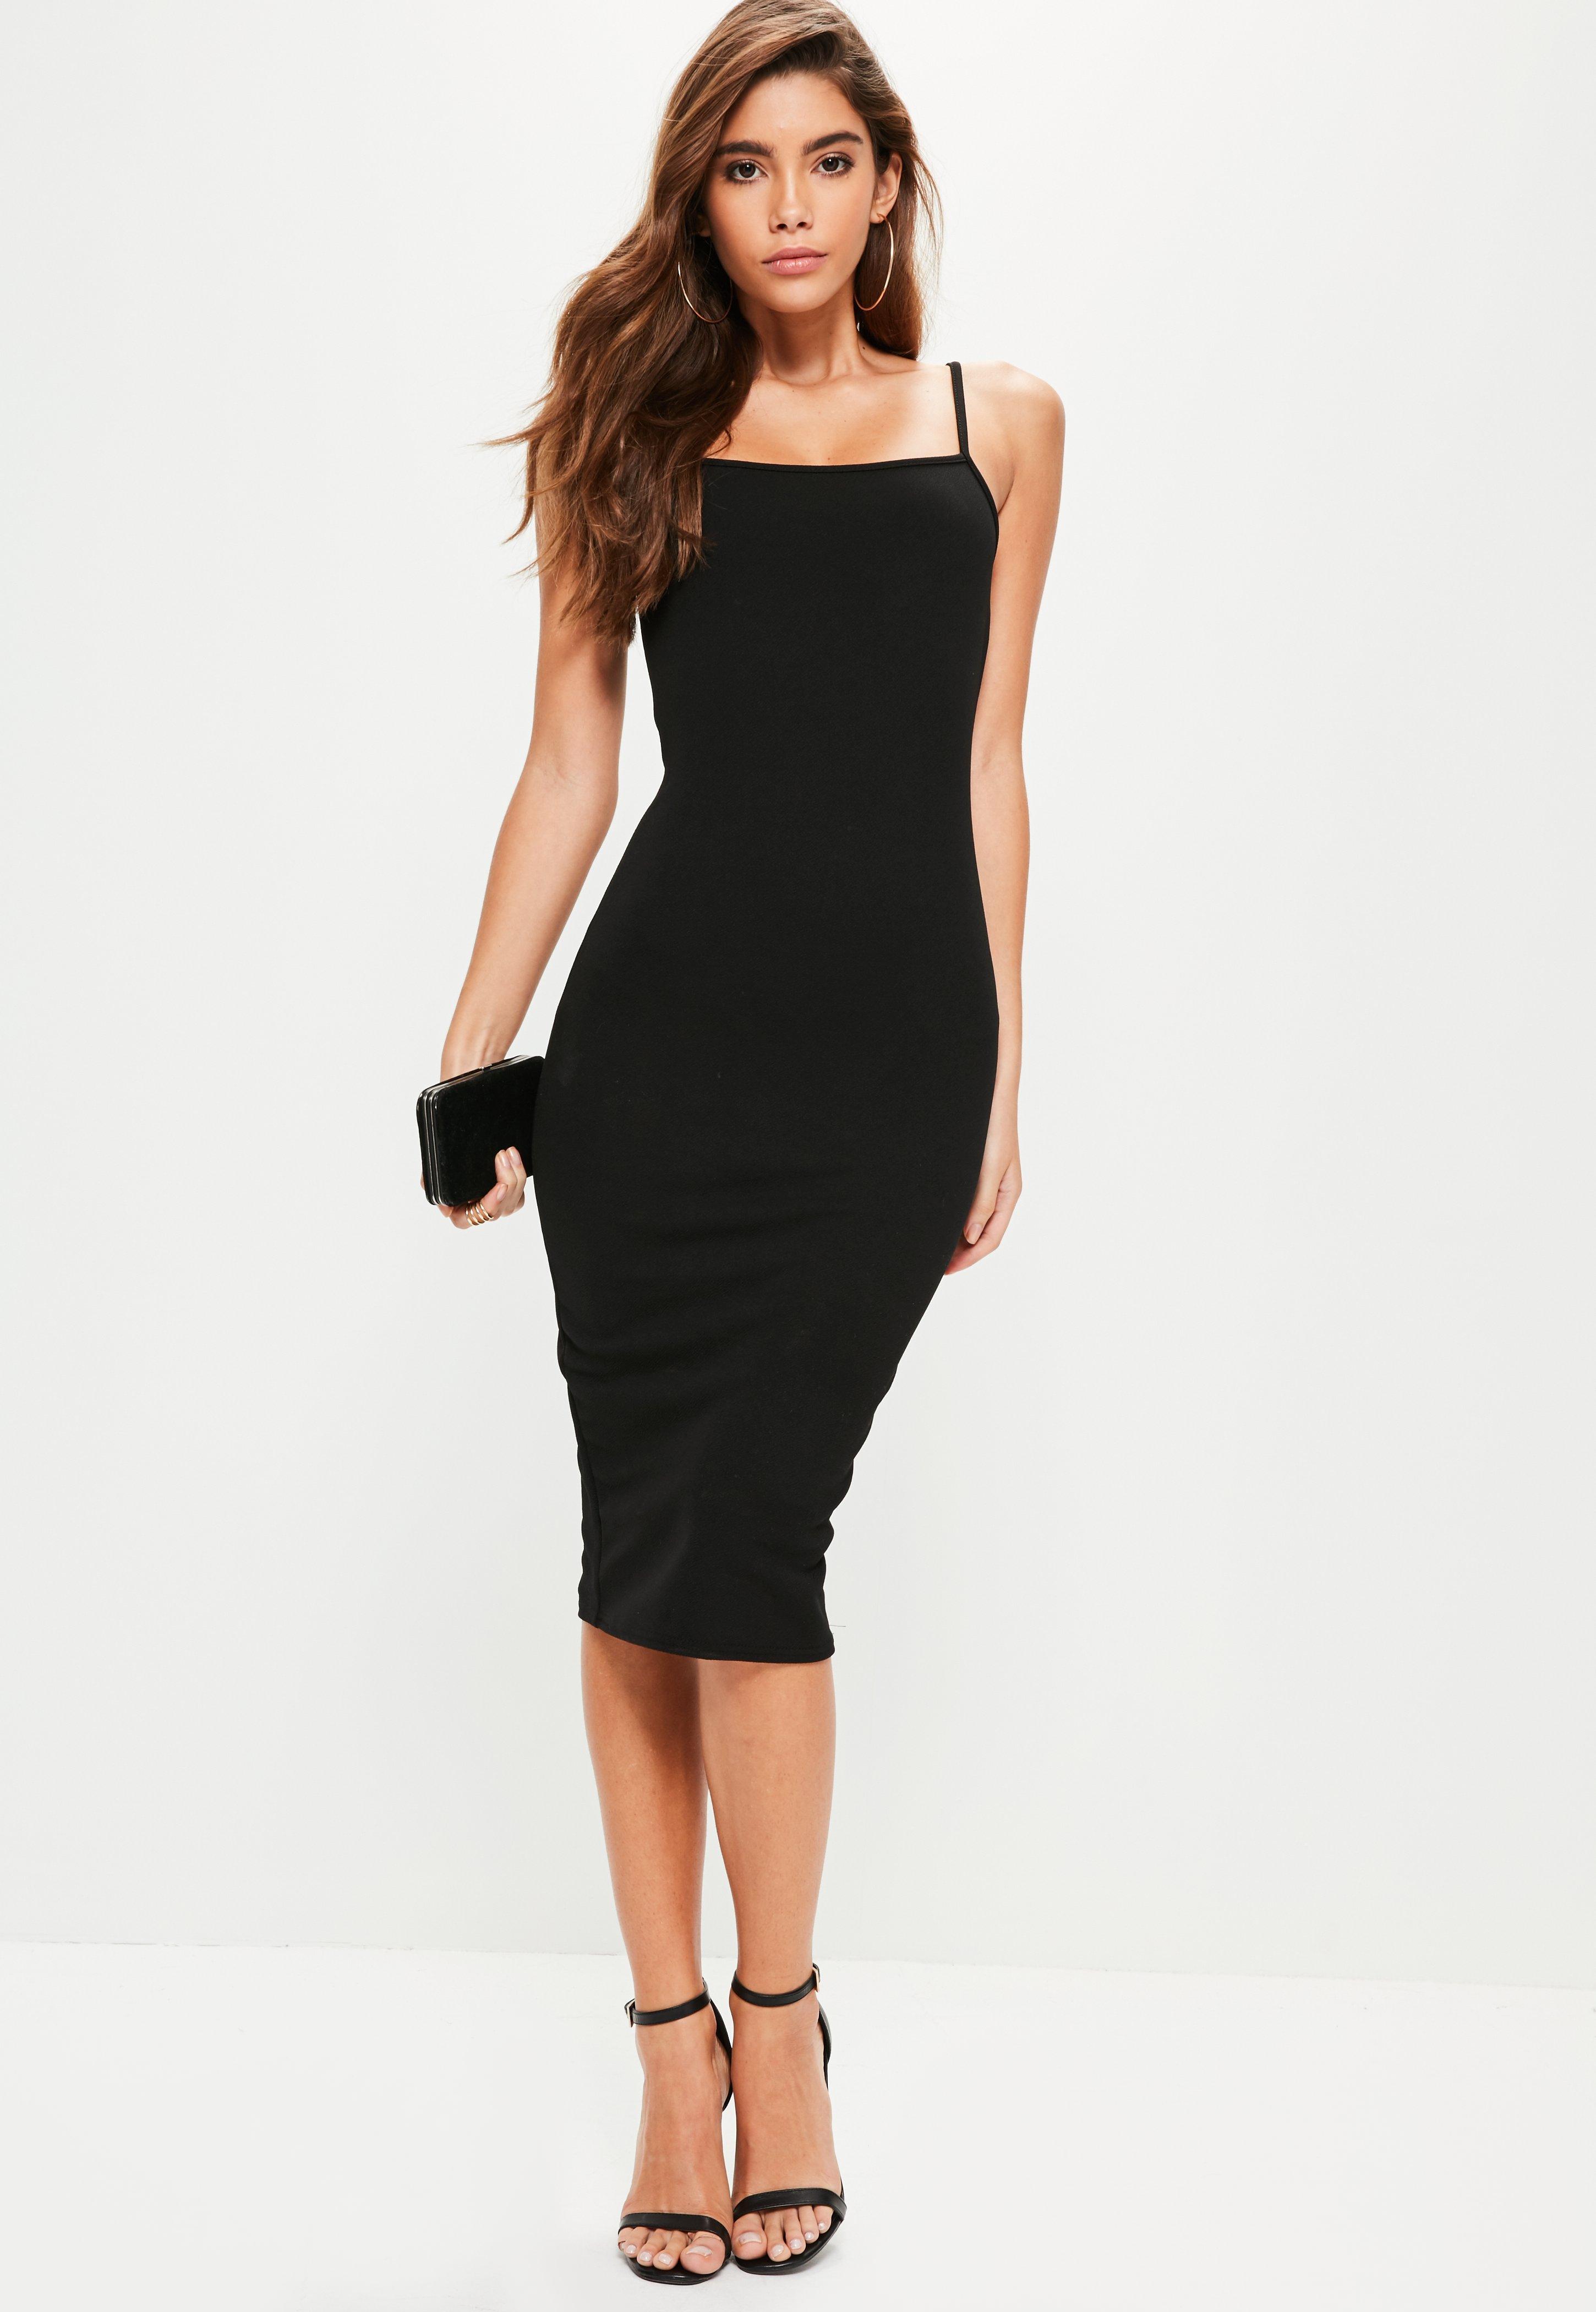 Black Square Neck Midi Dress